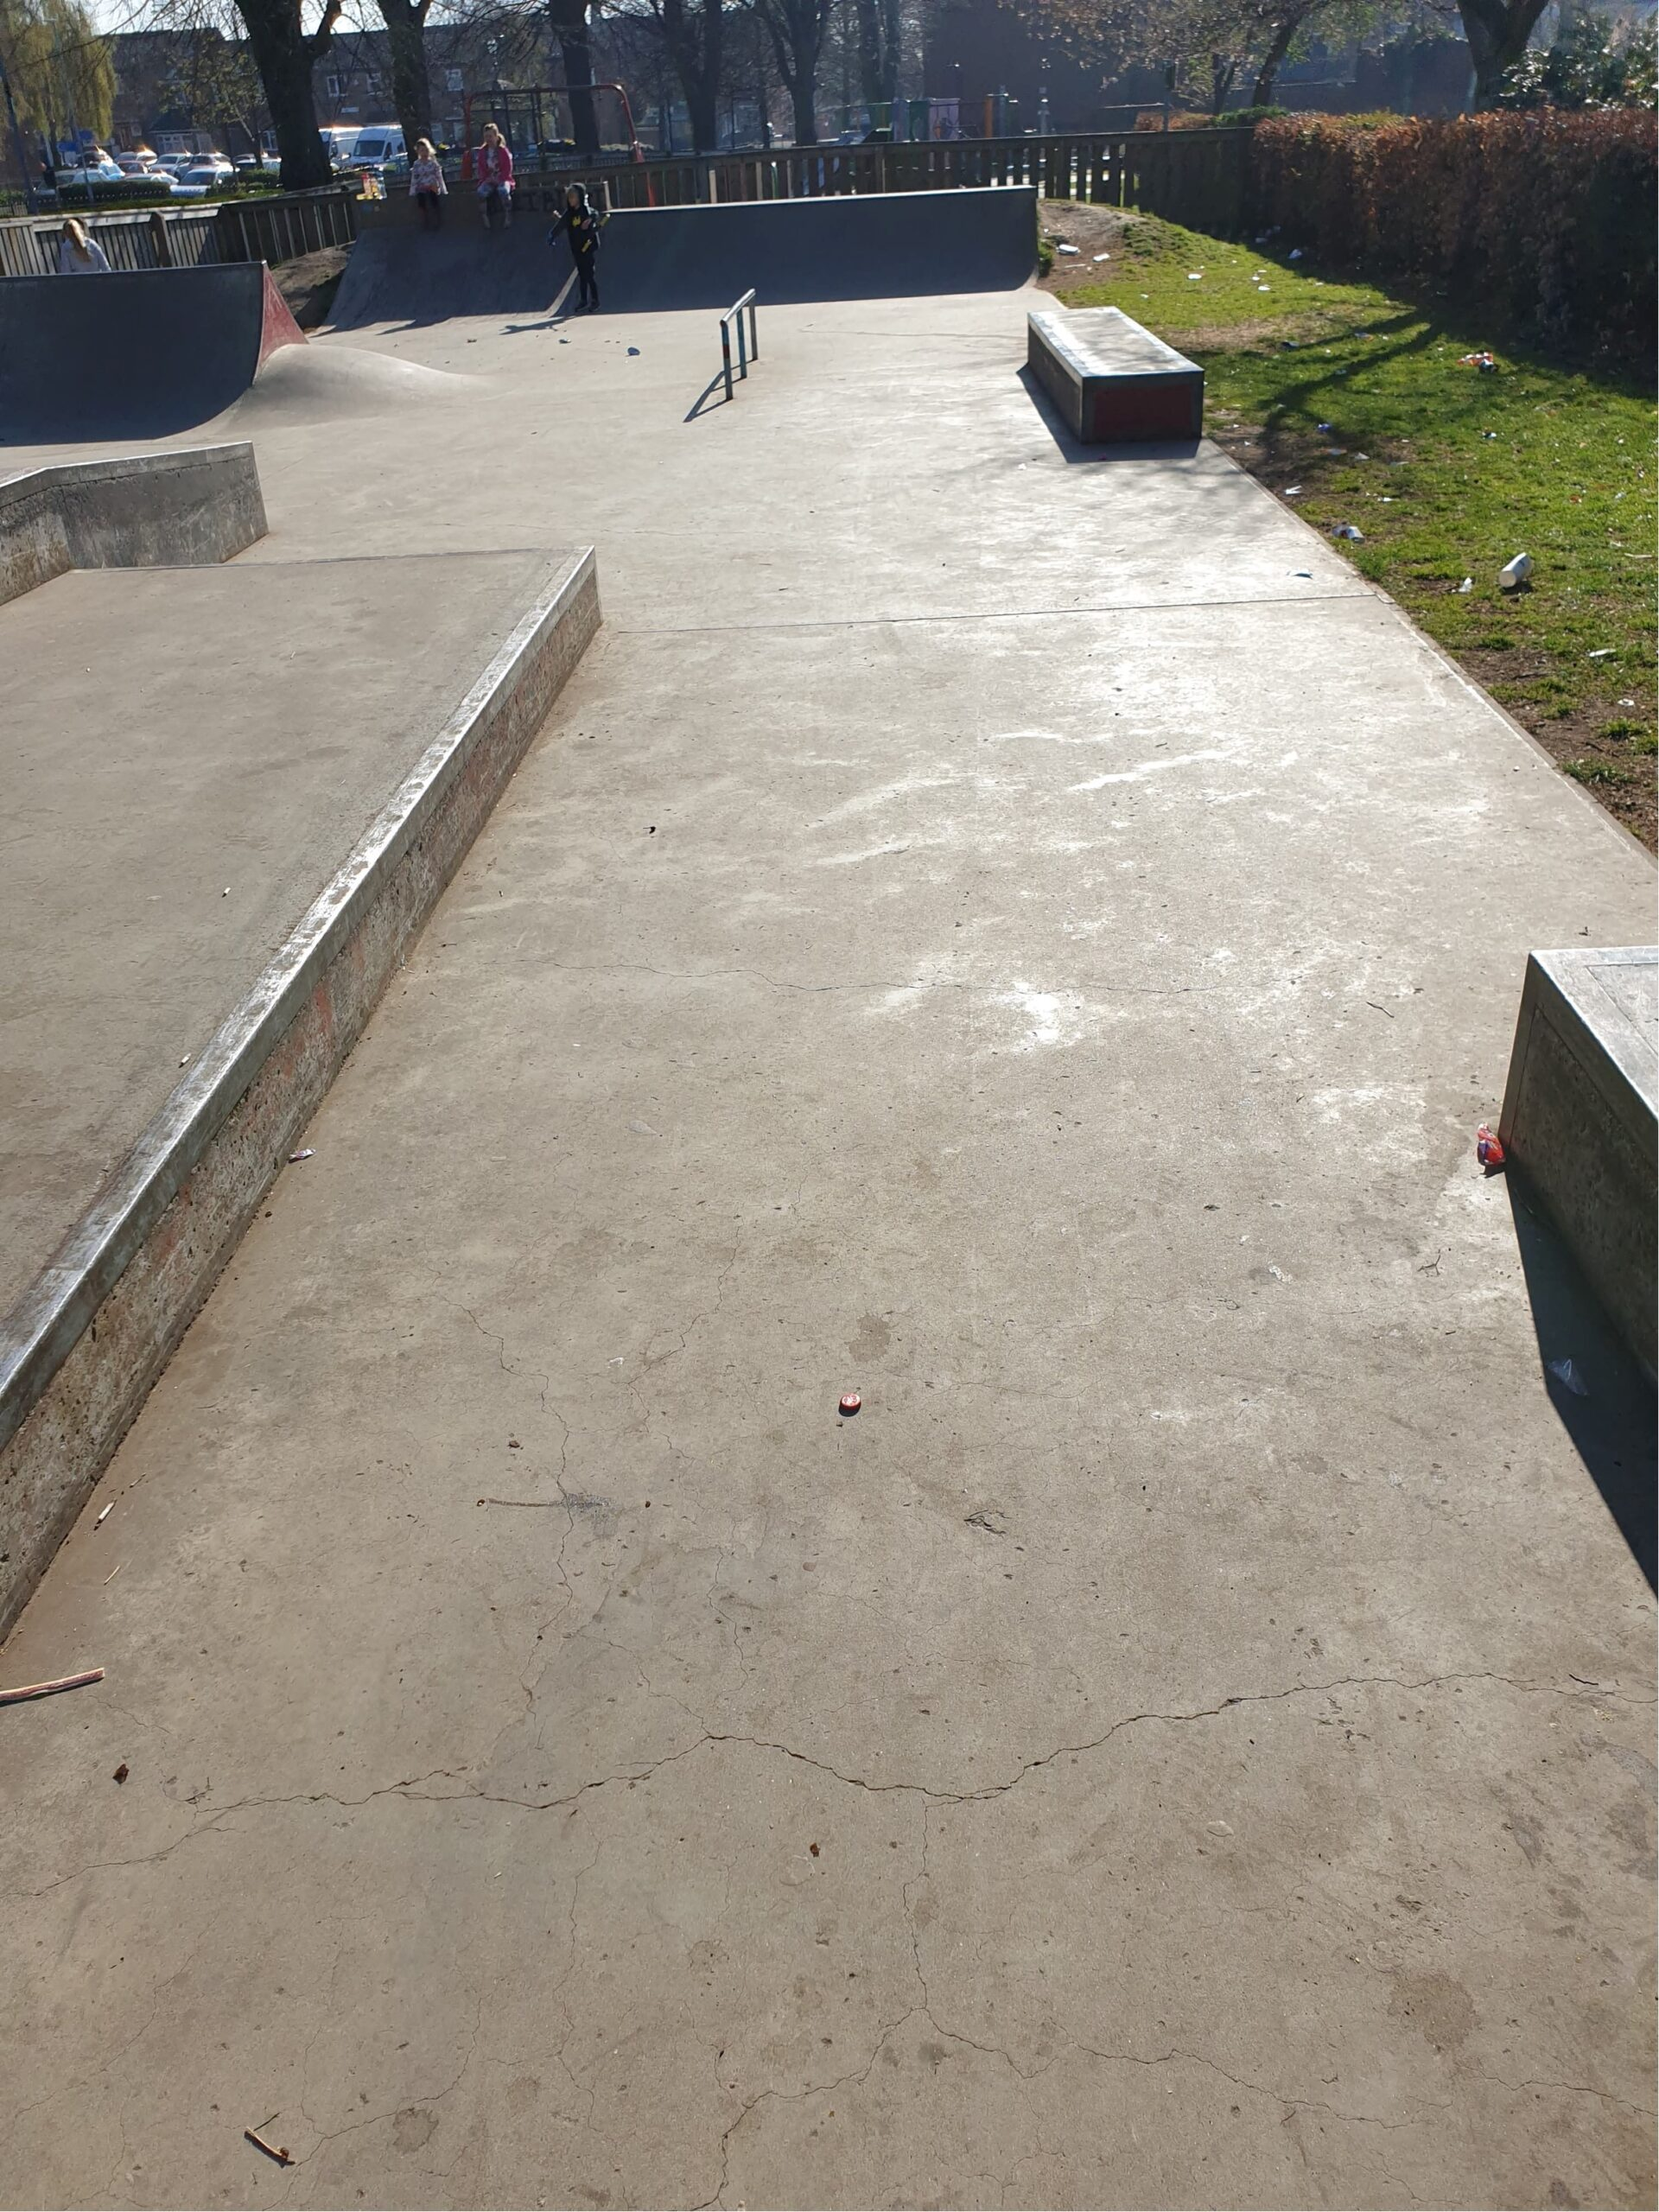 Skate-Park-1-scaled